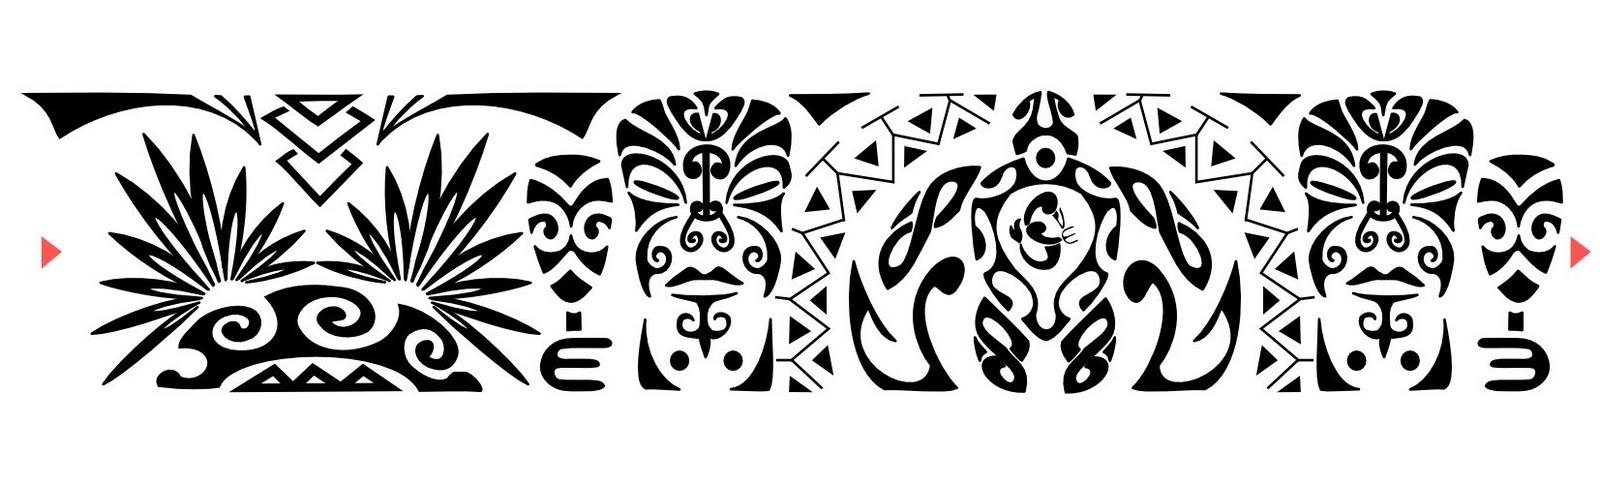 "armband tattoo polynesian tribal Maori/Samoano Bracciale ""  amicizia Valore,"